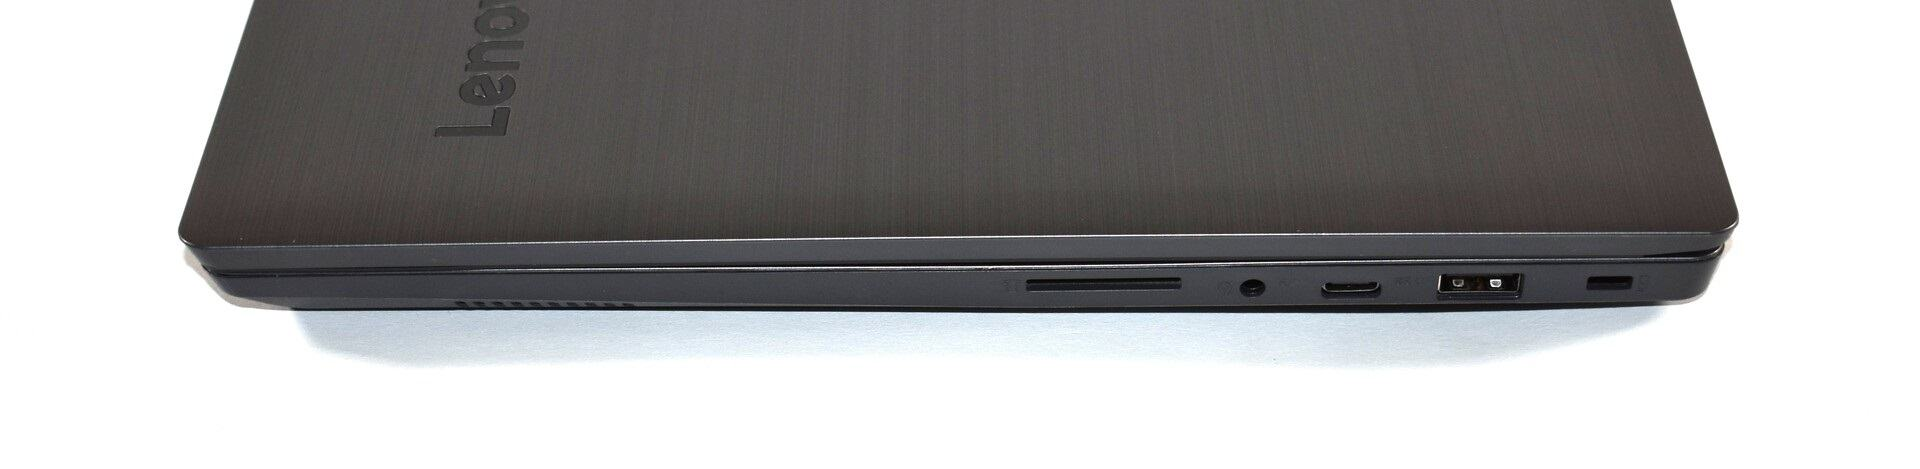 đánh giá Lenovo V330-14IKB